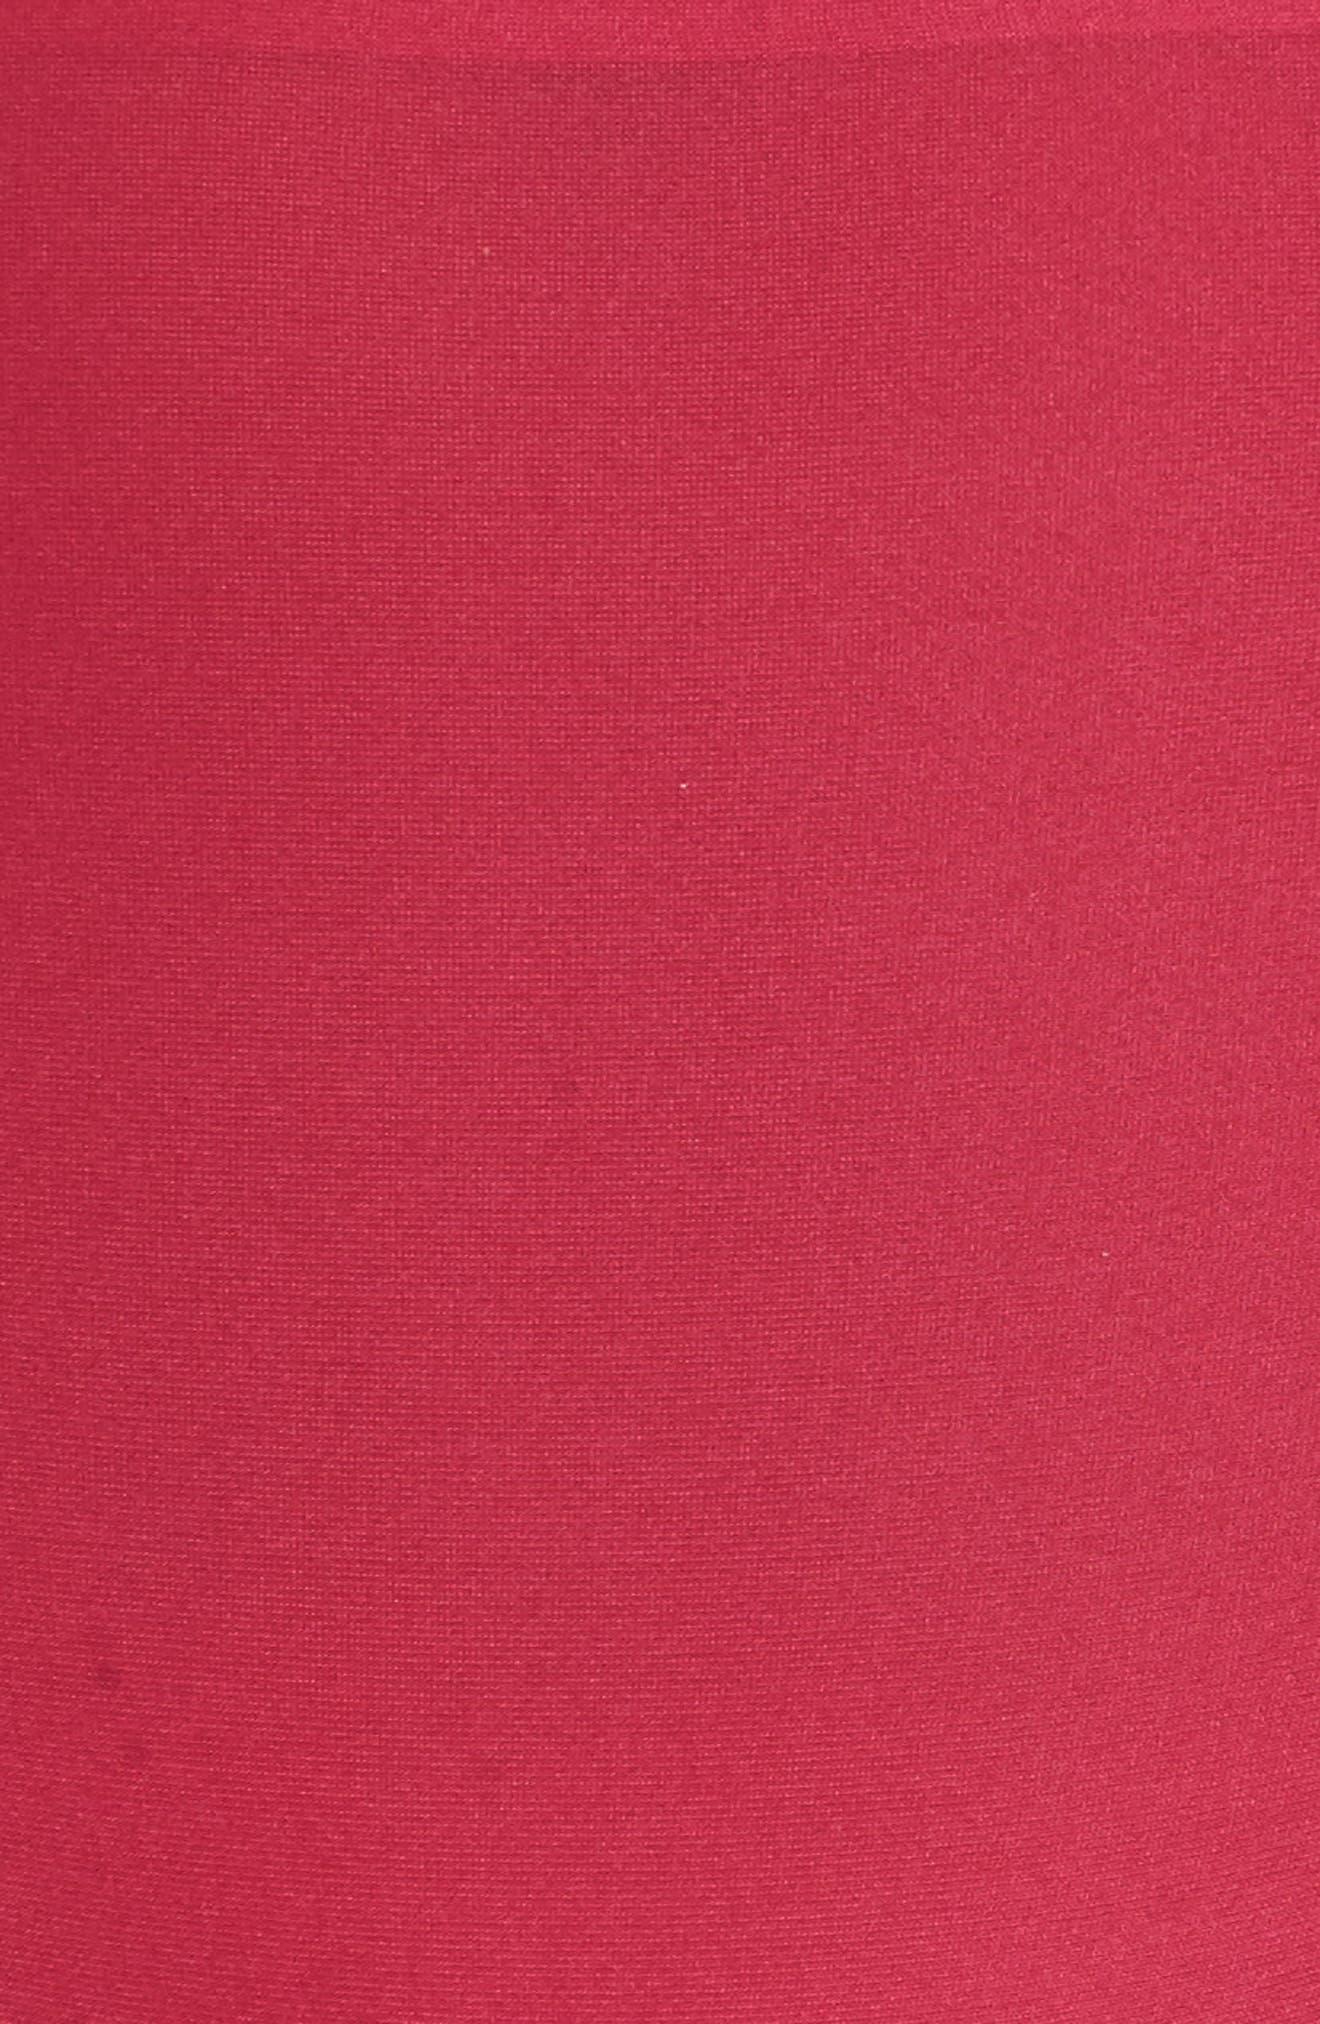 Soft Stretch High Waist Seamless Briefs,                             Alternate thumbnail 5, color,                             Magenta